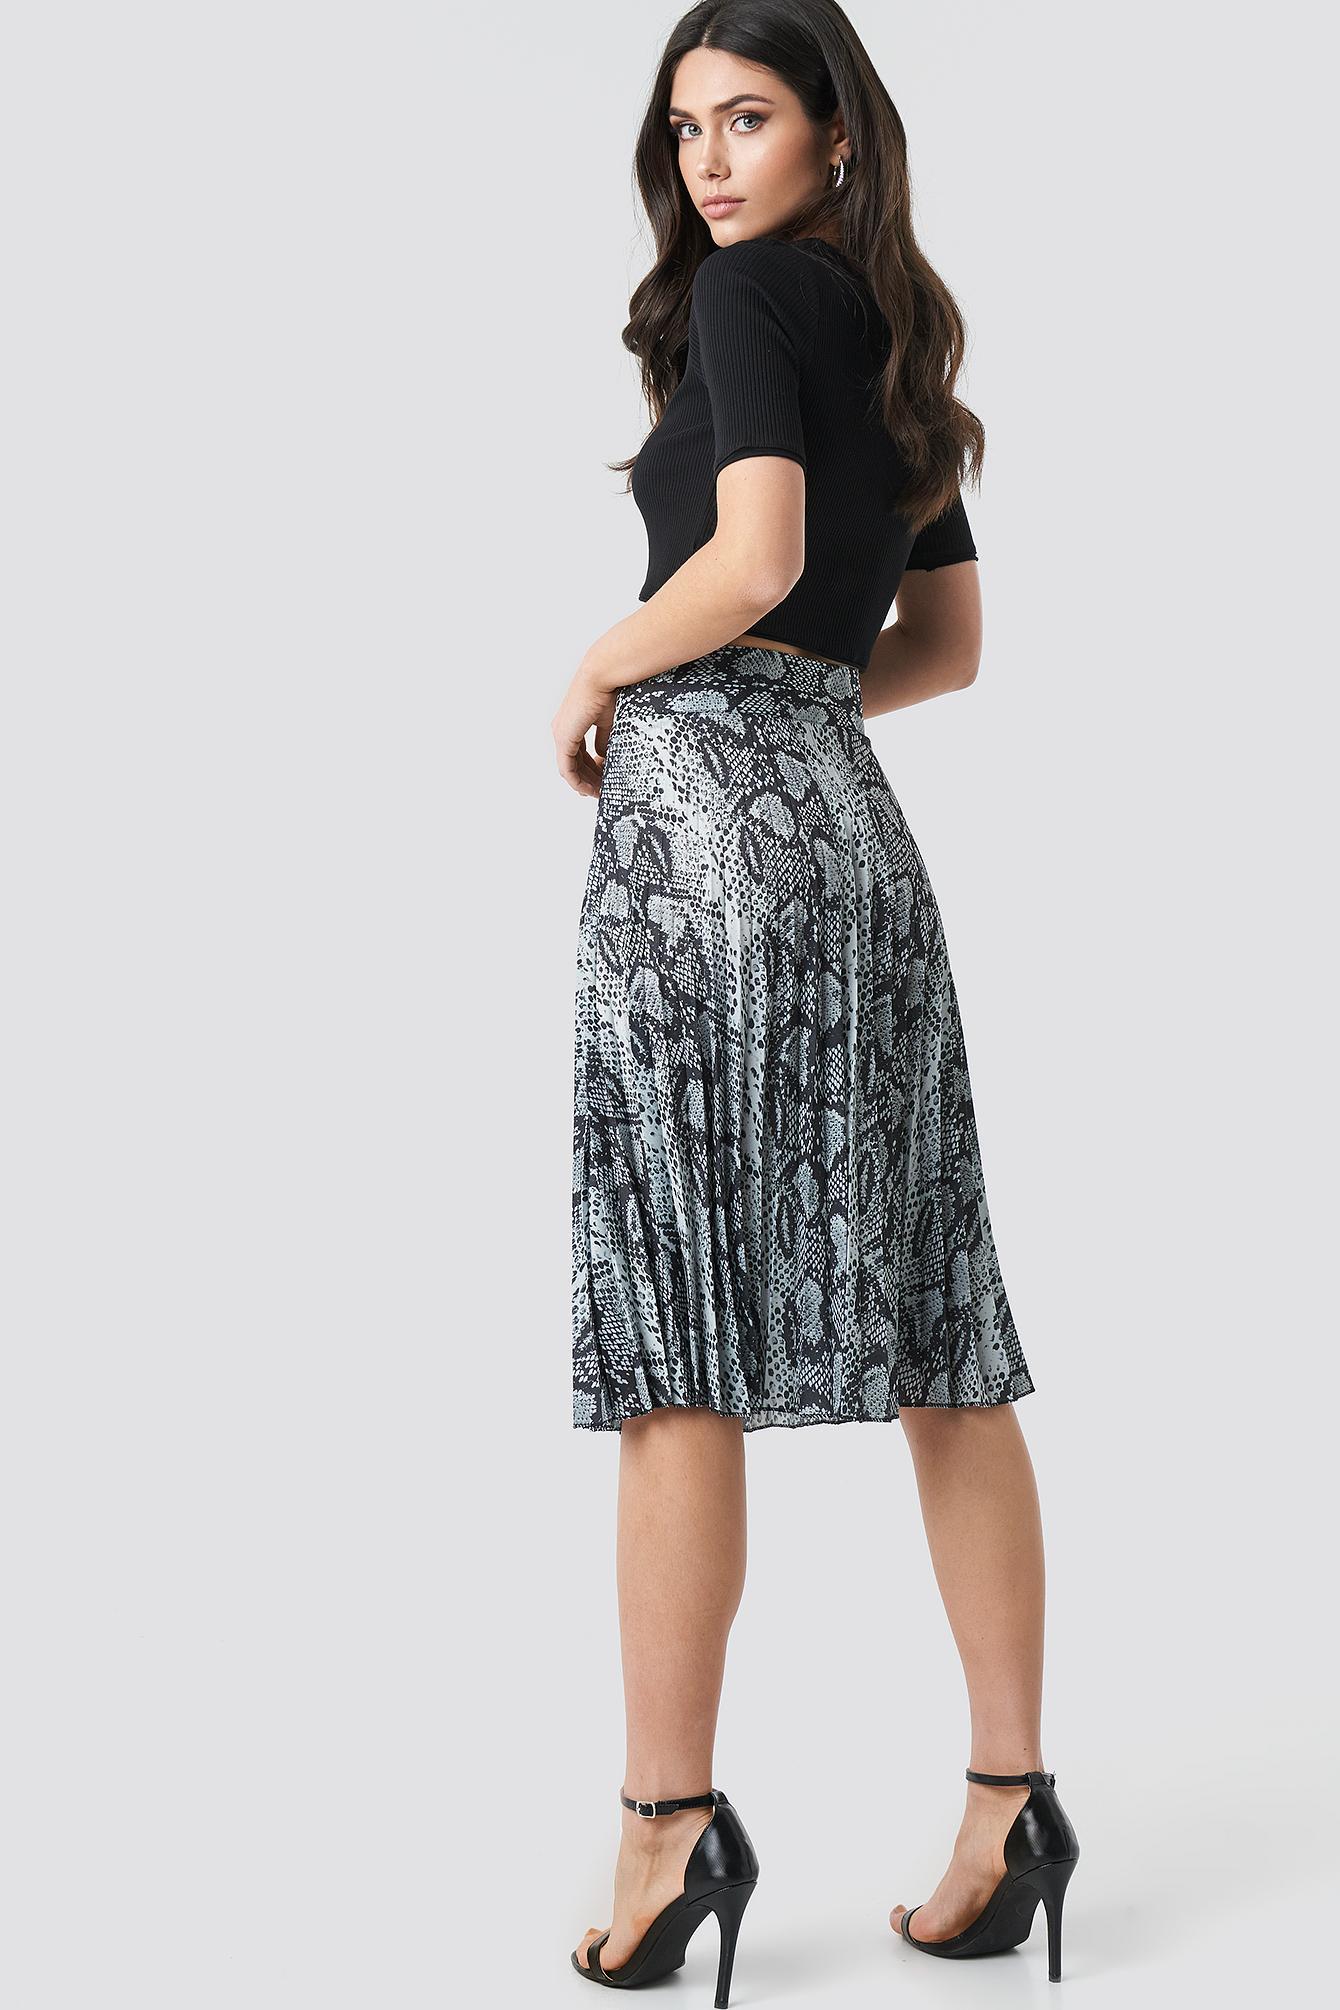 85a6ab1038 Trendyol - Black Snake Pattern Pleated Skirt Multicolor - Lyst. View  fullscreen